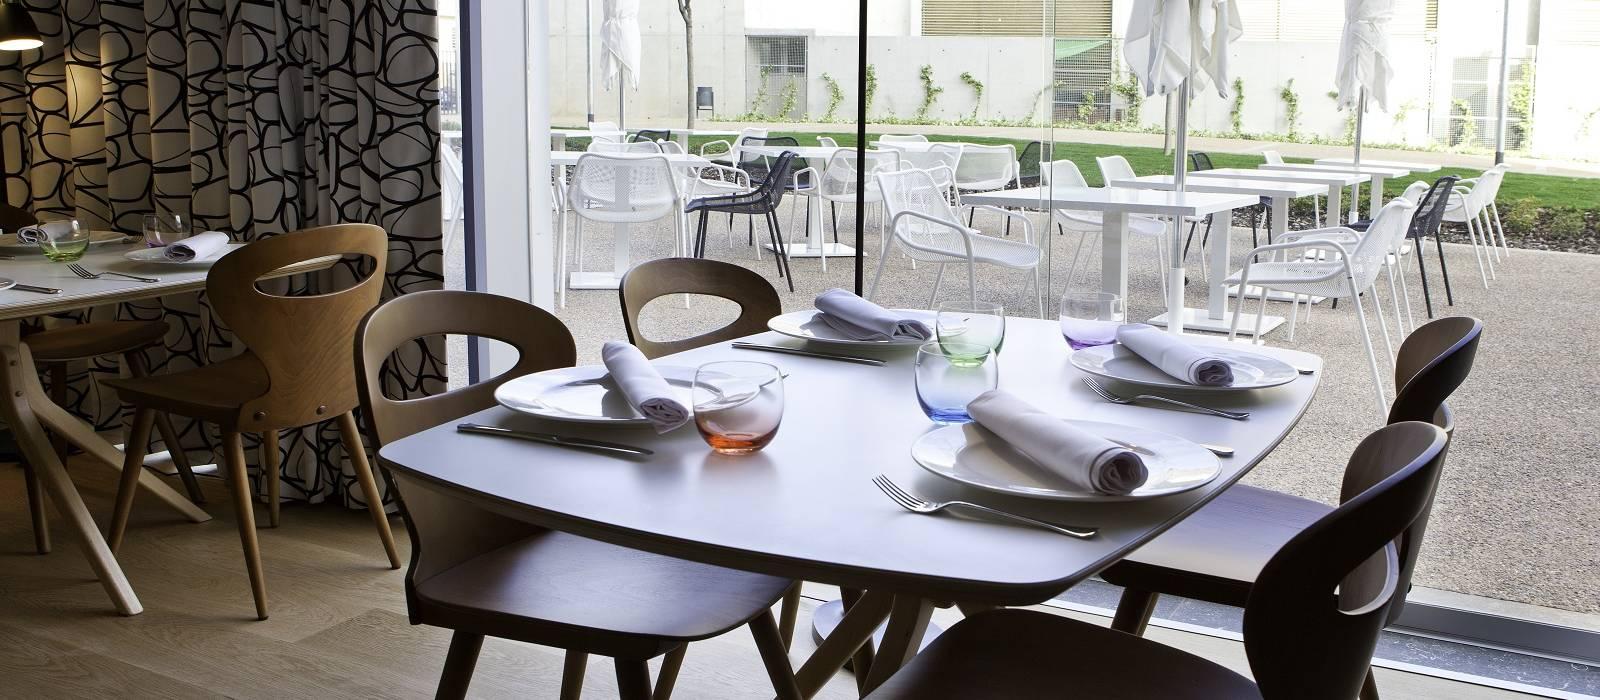 Restaurante Hopen - Vincci Bit